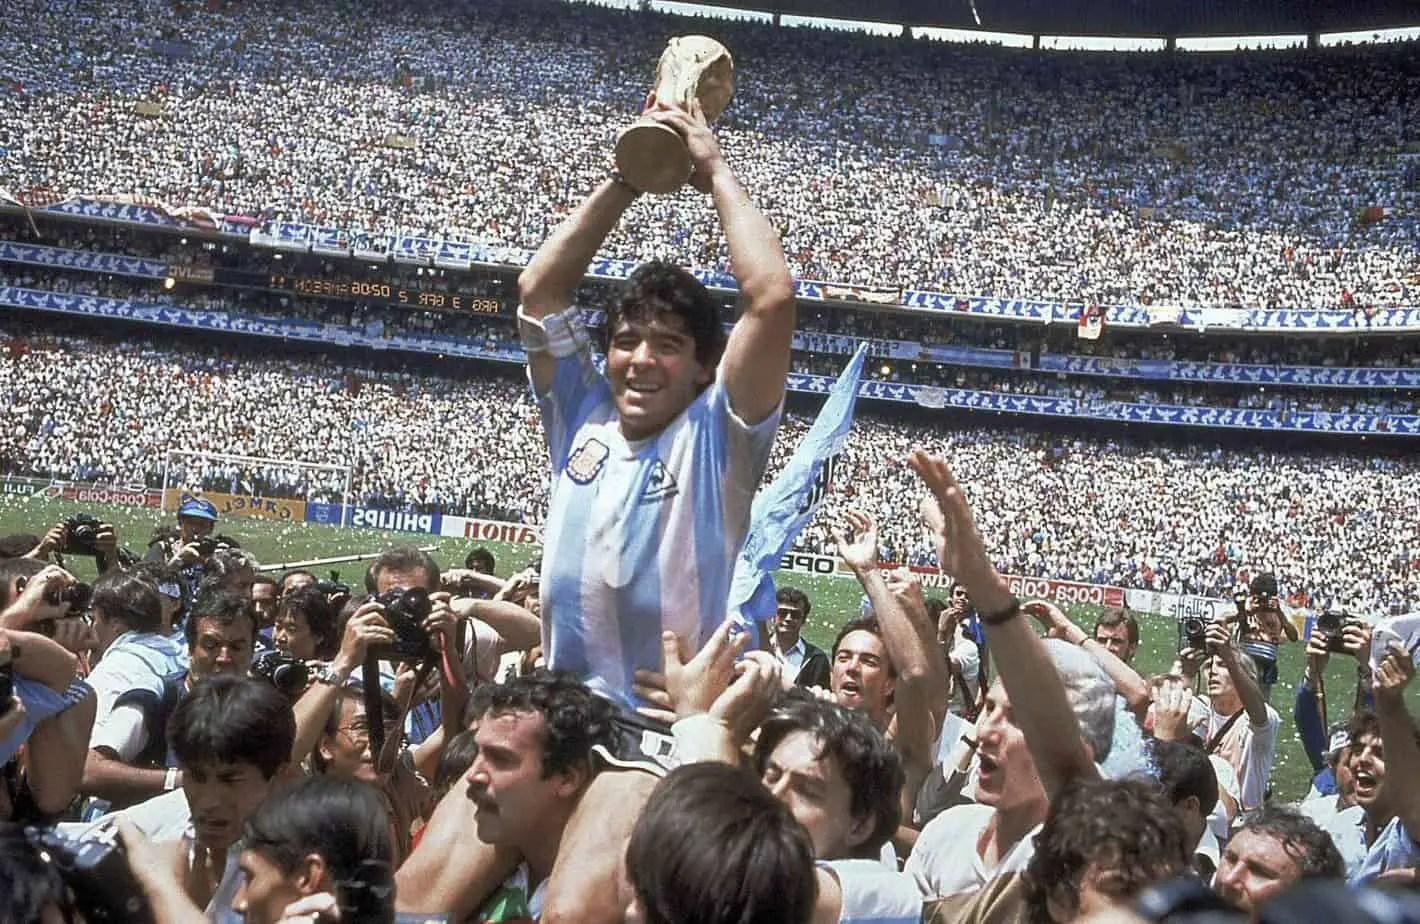 Diego Maradona Died: How Did Football Legend Die?